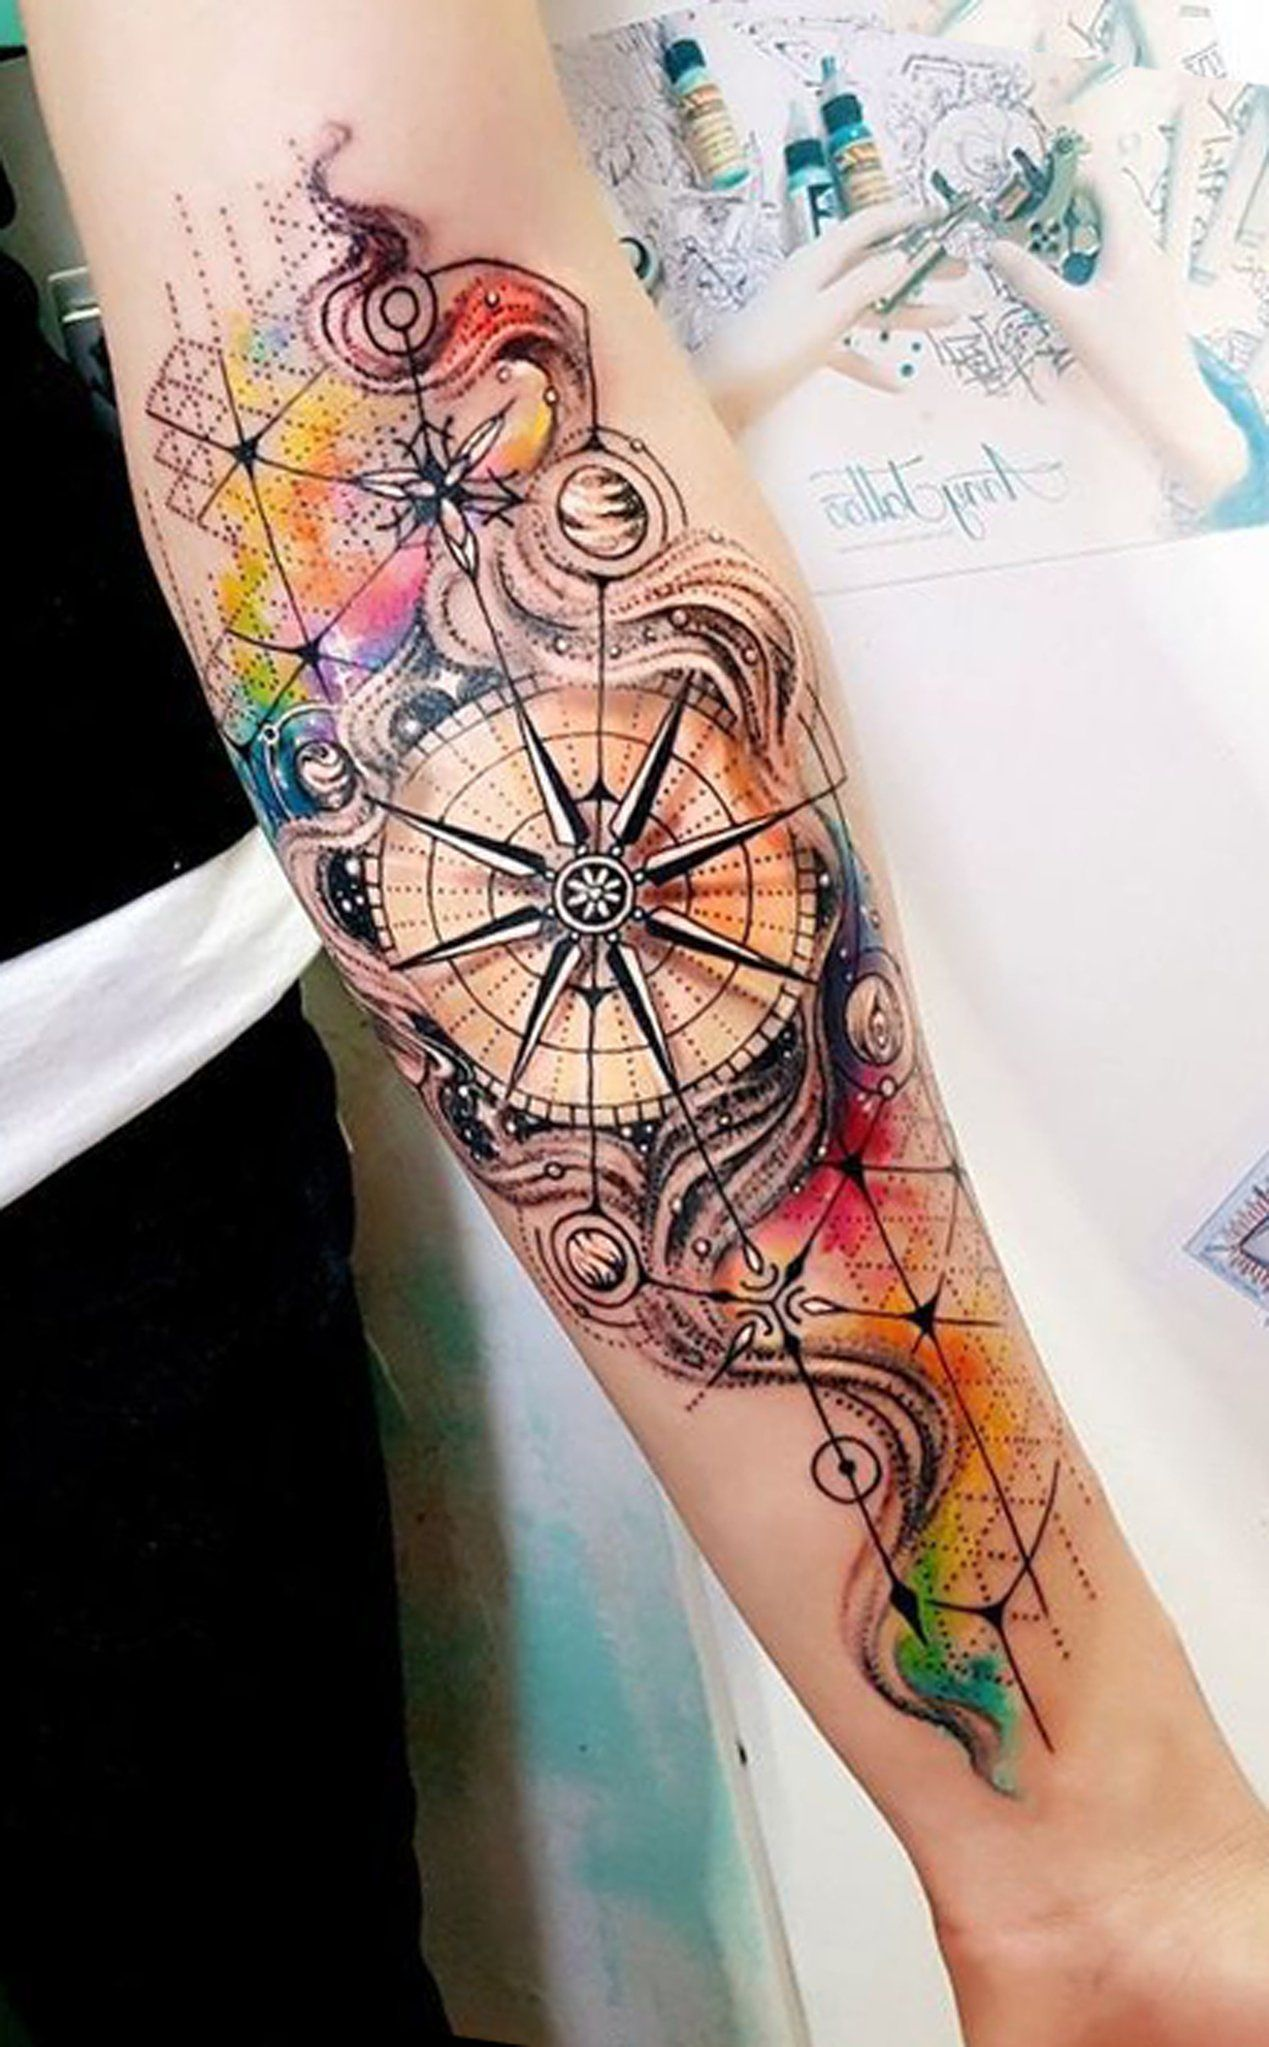 watercolor compass inner forearm tattoo ideas for women id es de tatouage avant bras boussole. Black Bedroom Furniture Sets. Home Design Ideas